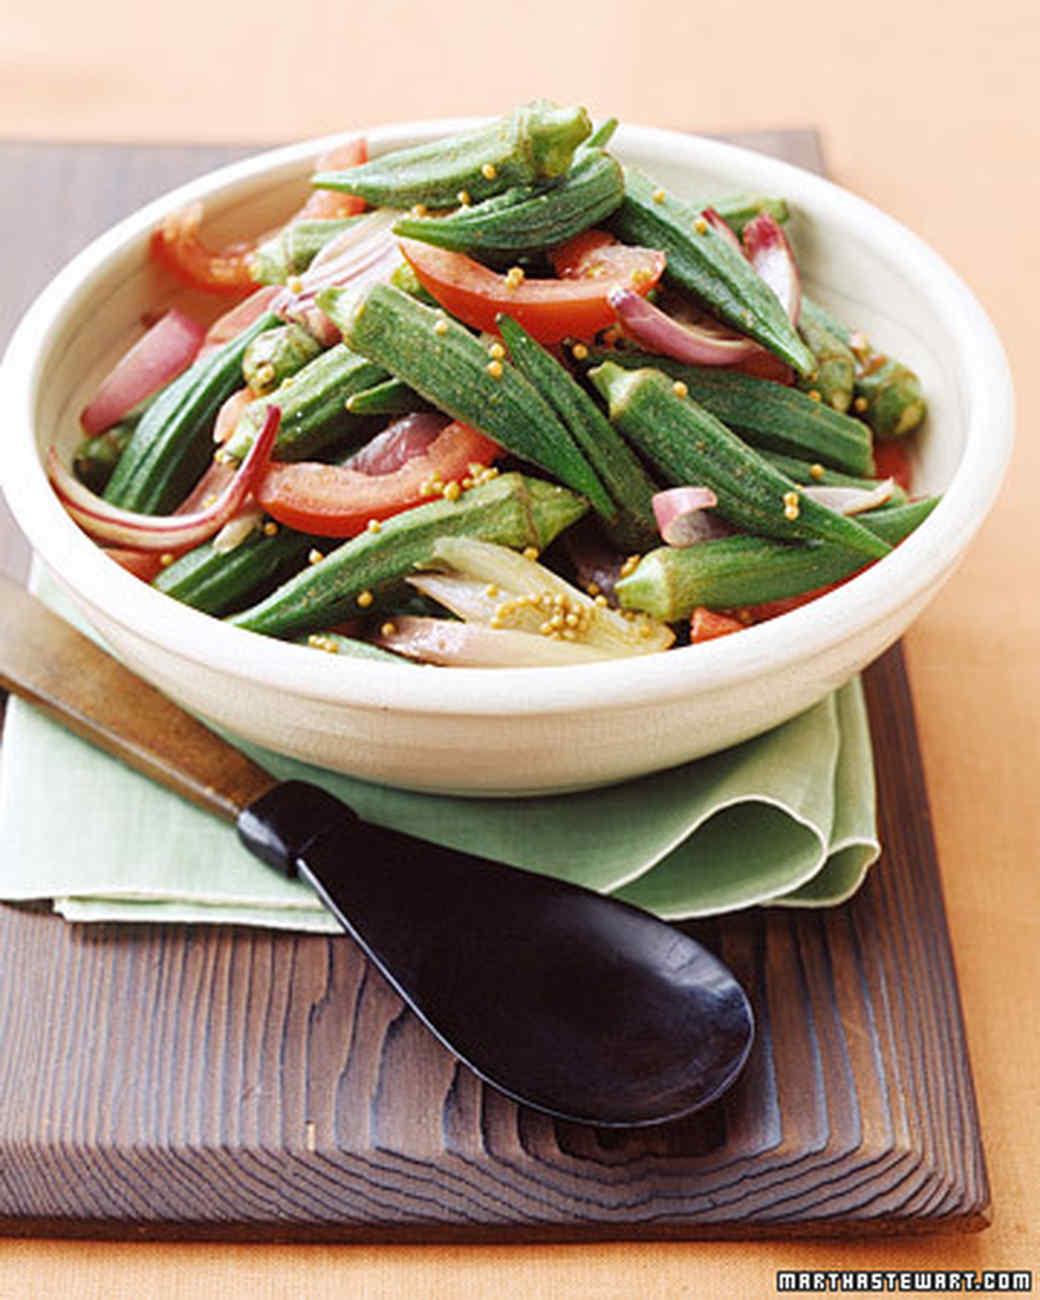 Quick Vegetable Side Dish Recipes | Martha Stewart